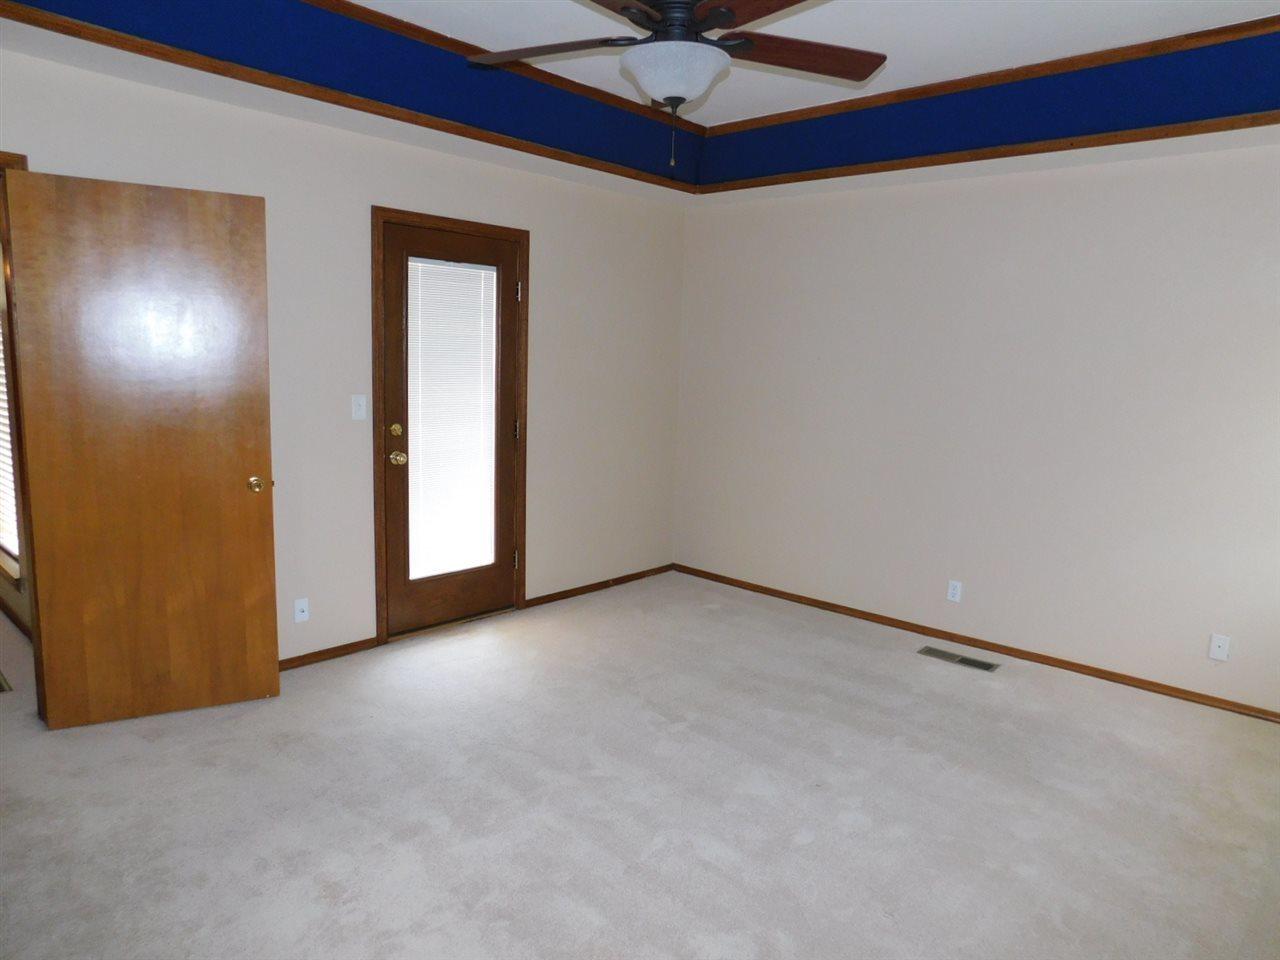 #century21groupone, #homesforsaleponcacity, #poncacityrealestate | 300 Michael Ln. Ponca City, OK 74604 14